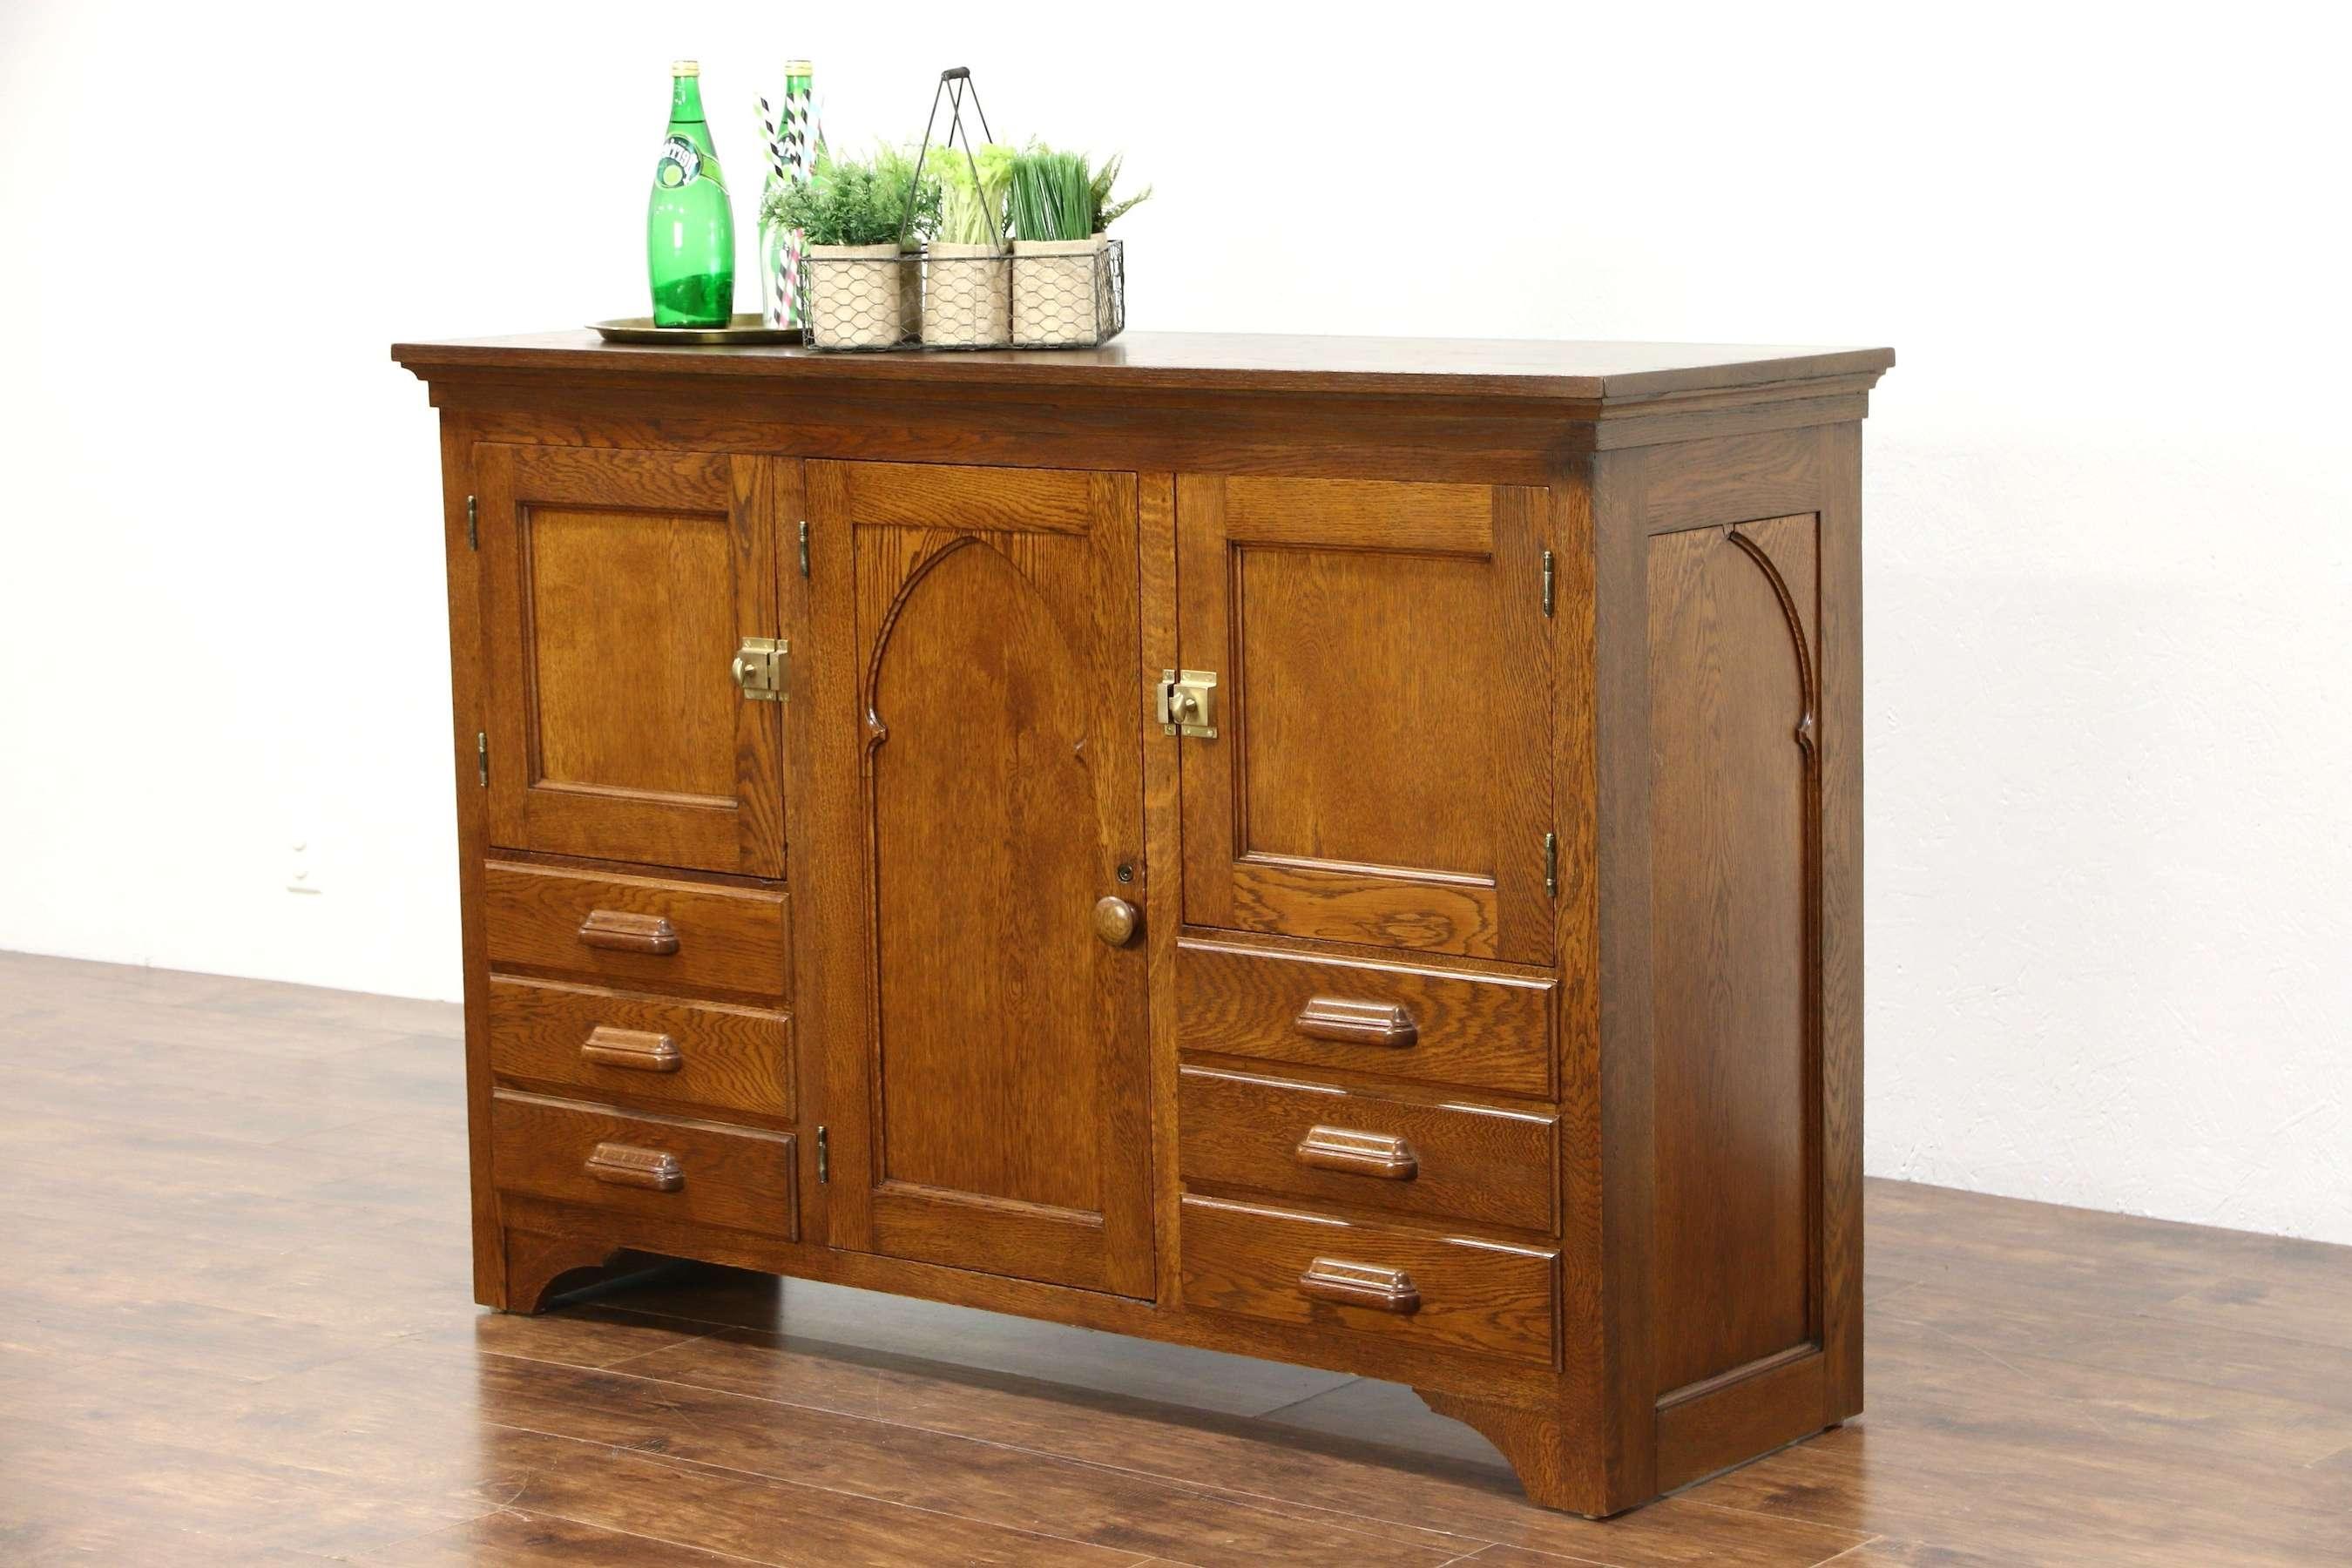 Sold – Gothic Carved 1890 Antique Oak Sideboard Cabinet Or Tv Pertaining To Antique Oak Sideboards (View 14 of 20)